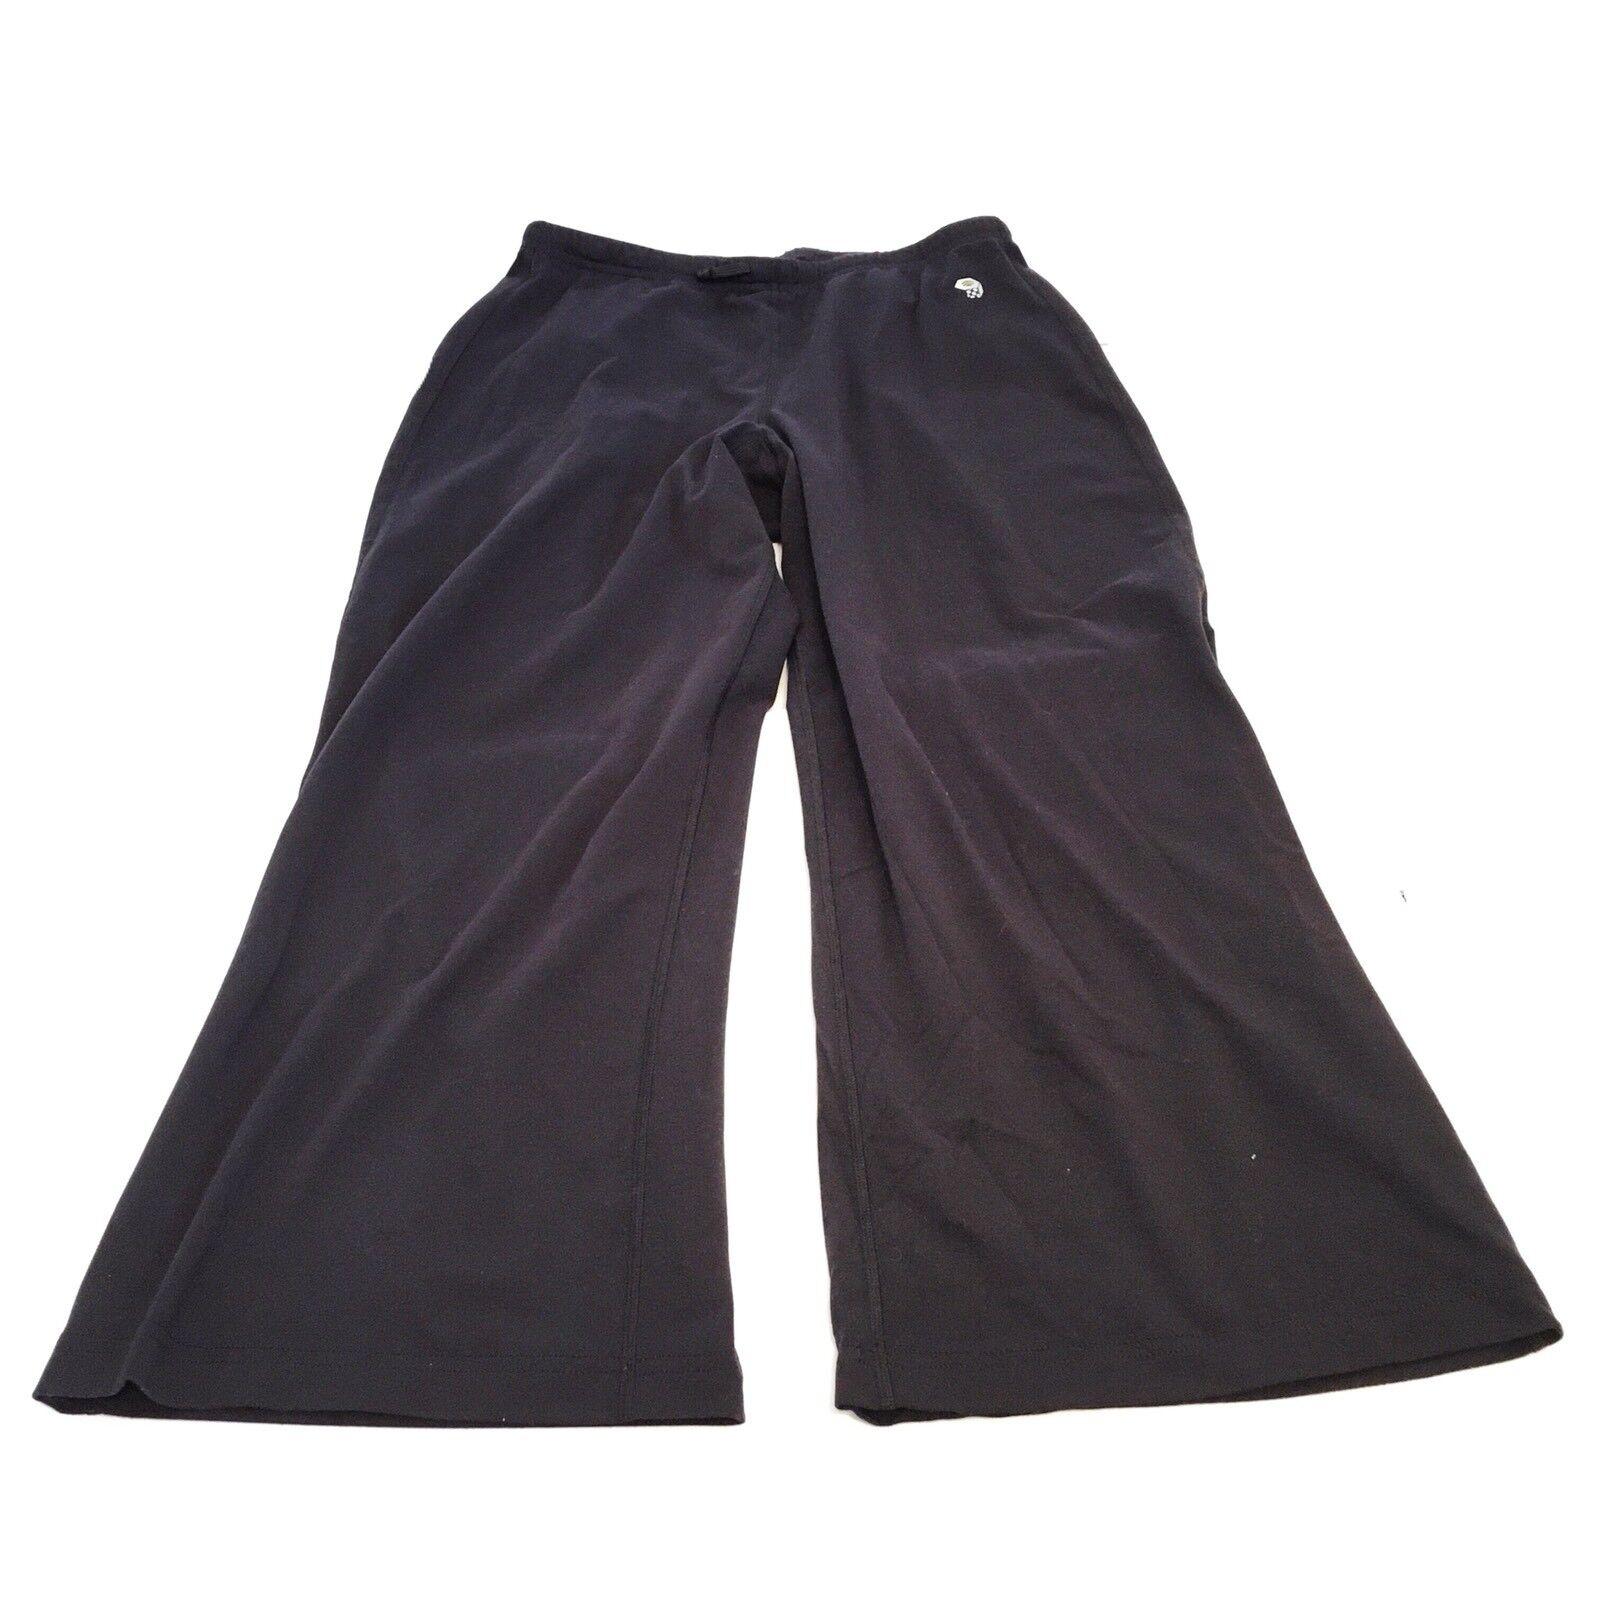 Mountain Hardwear Small Pants Black Crop Stretch Running Athletic Capri